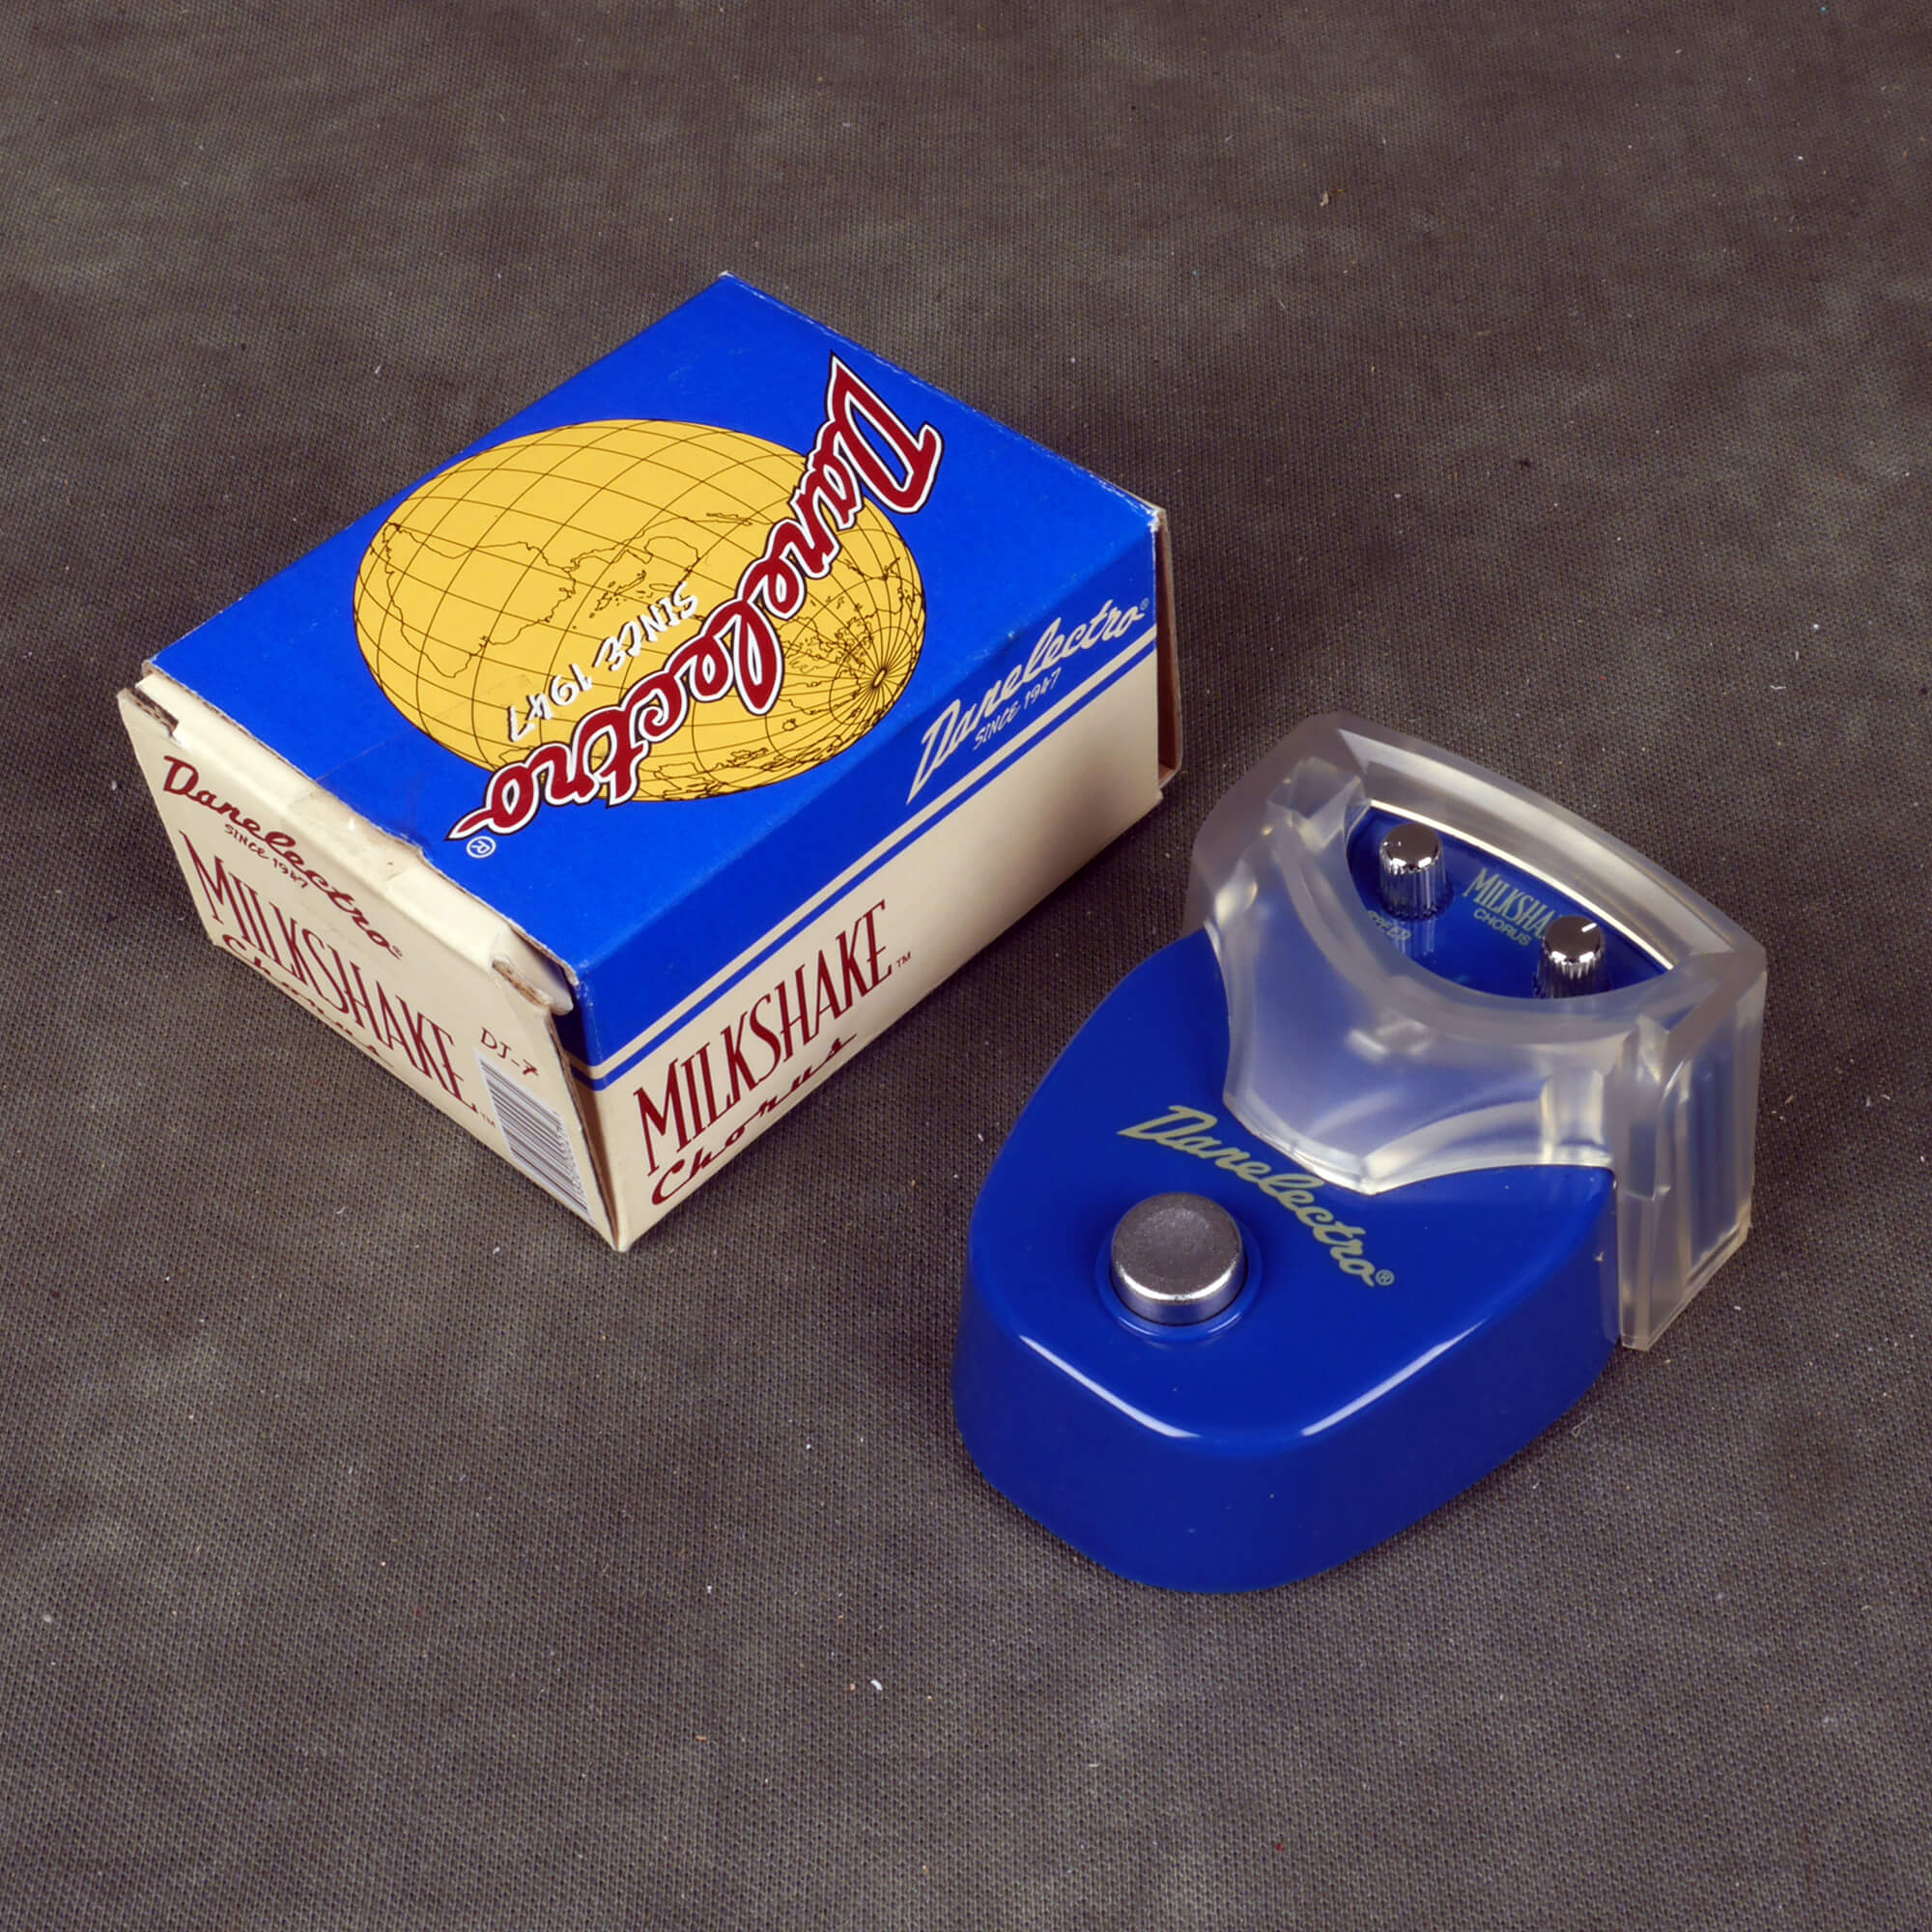 Danelectro Milkshake Chorus FX Pedal w/Box - 2nd Hand